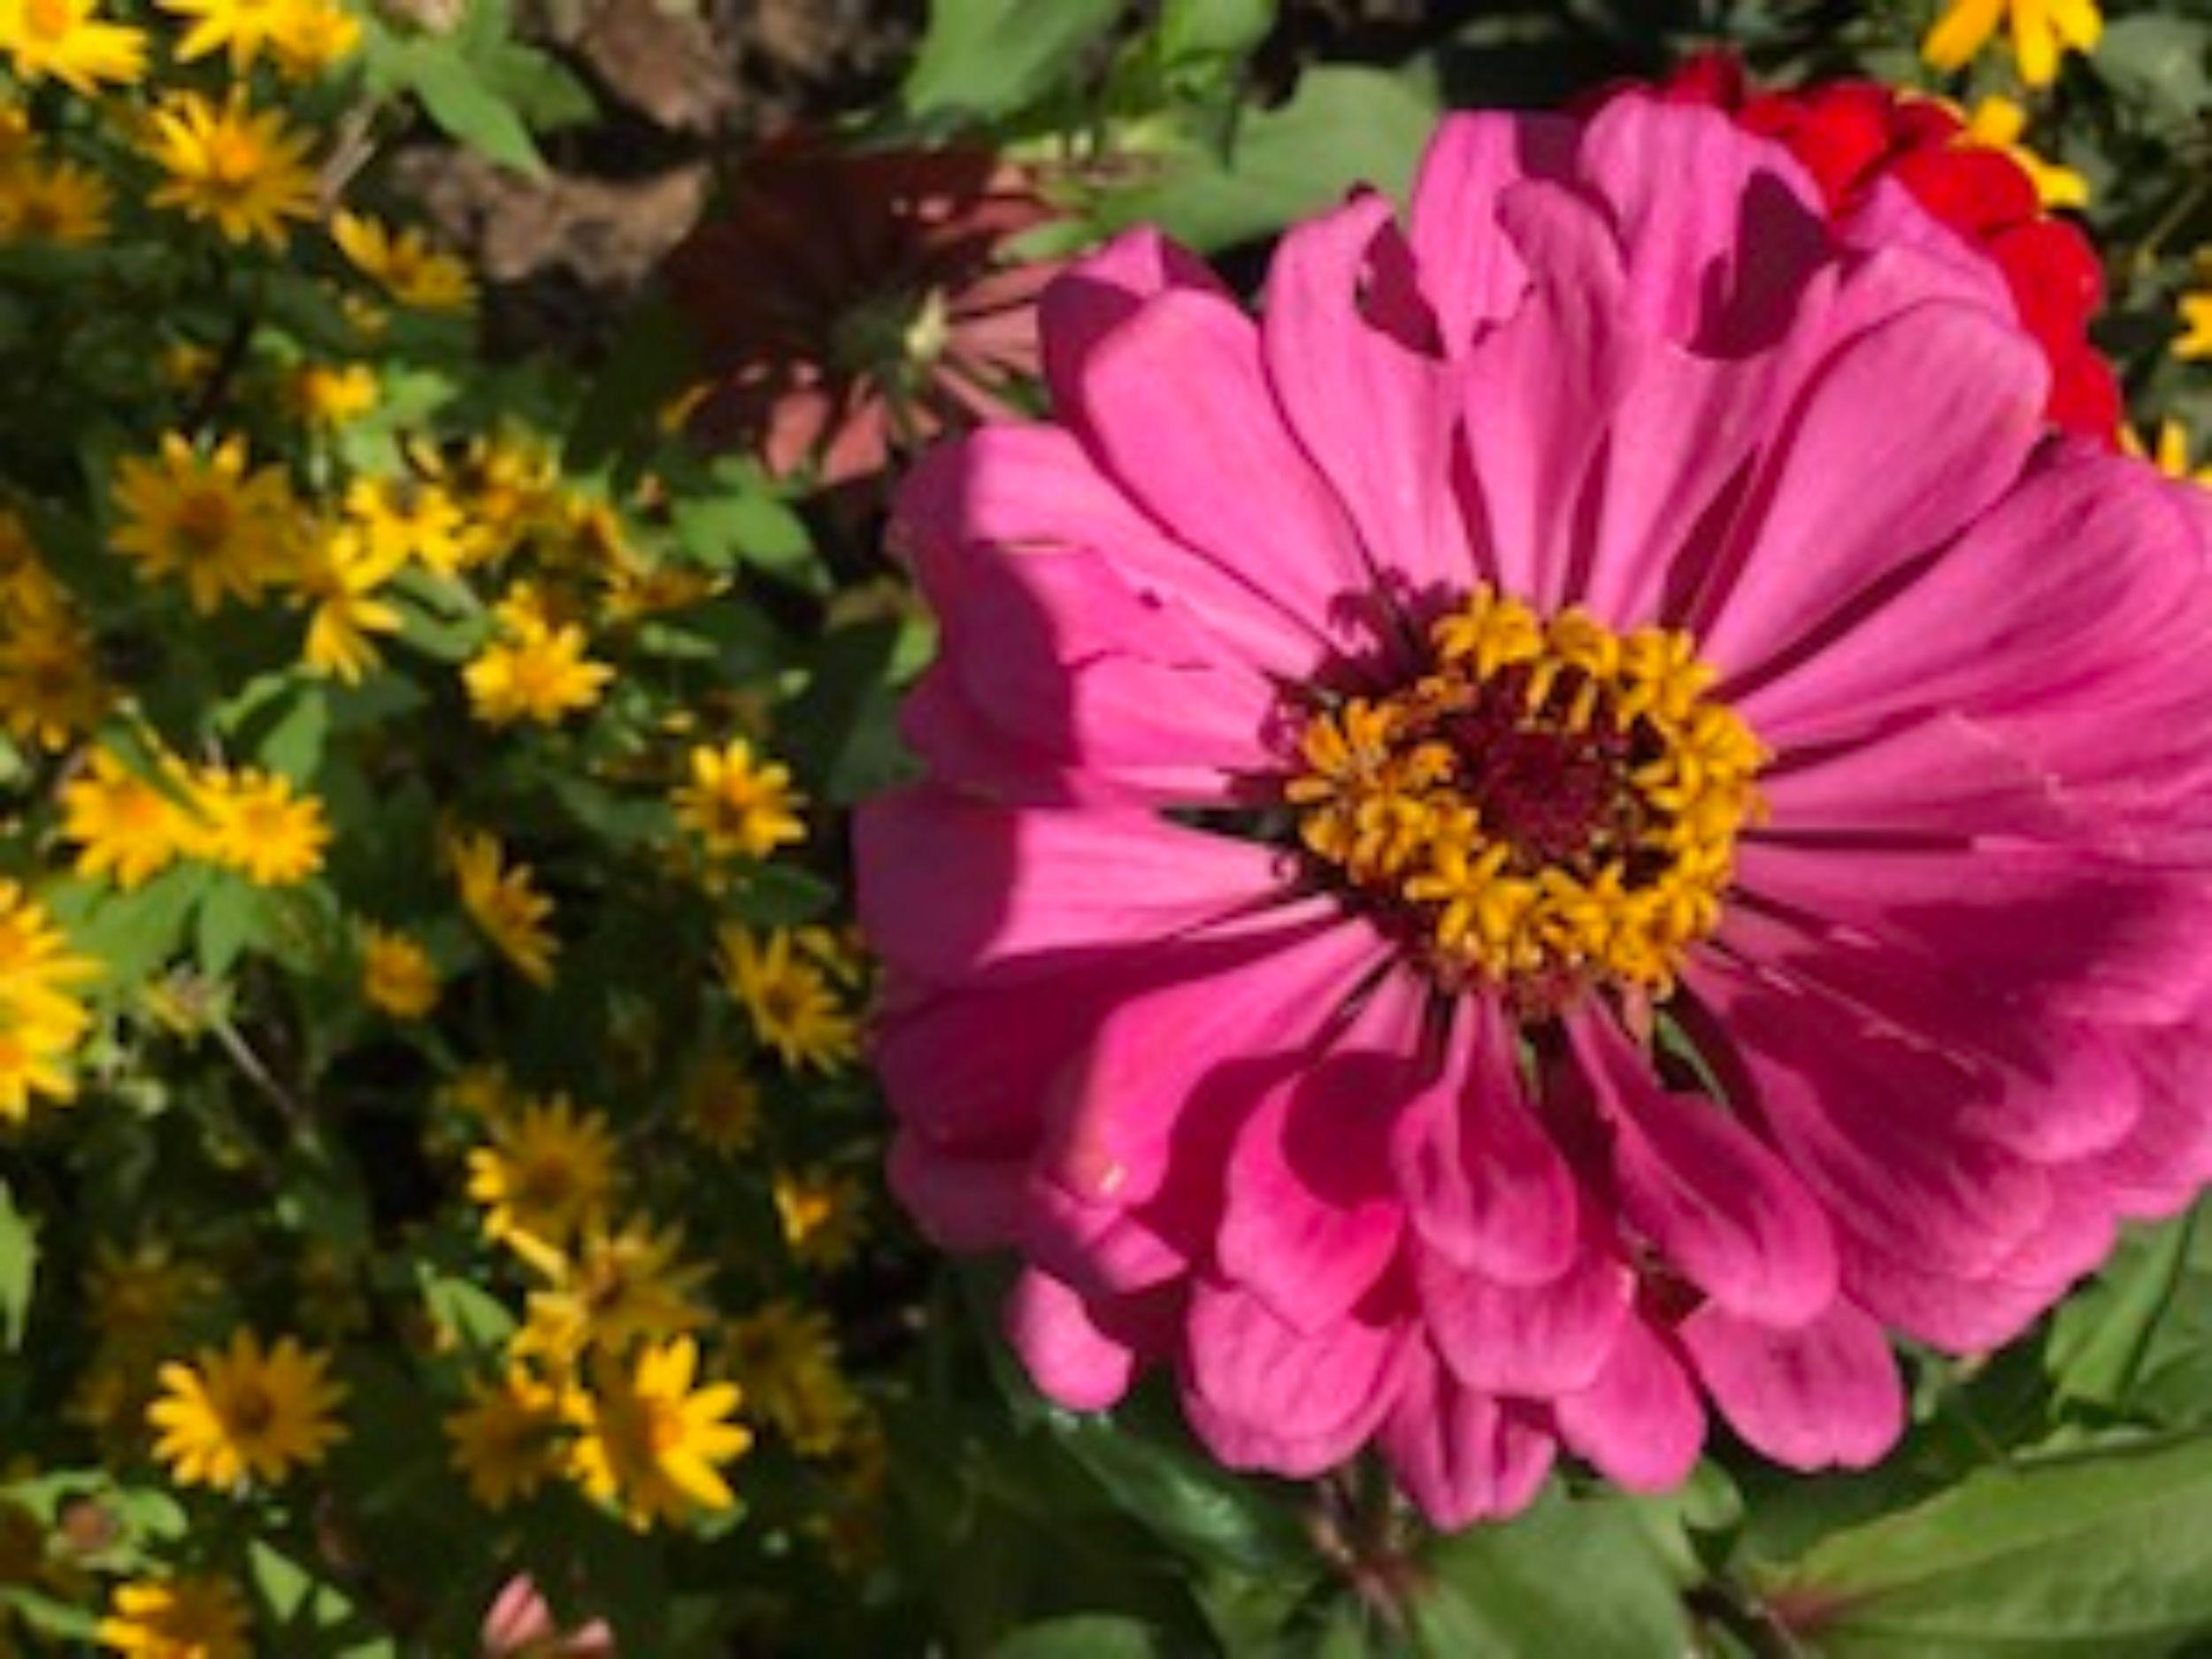 Zinnias in bloom with Bloom;,Waynewood Elementary, Alexandria, VA